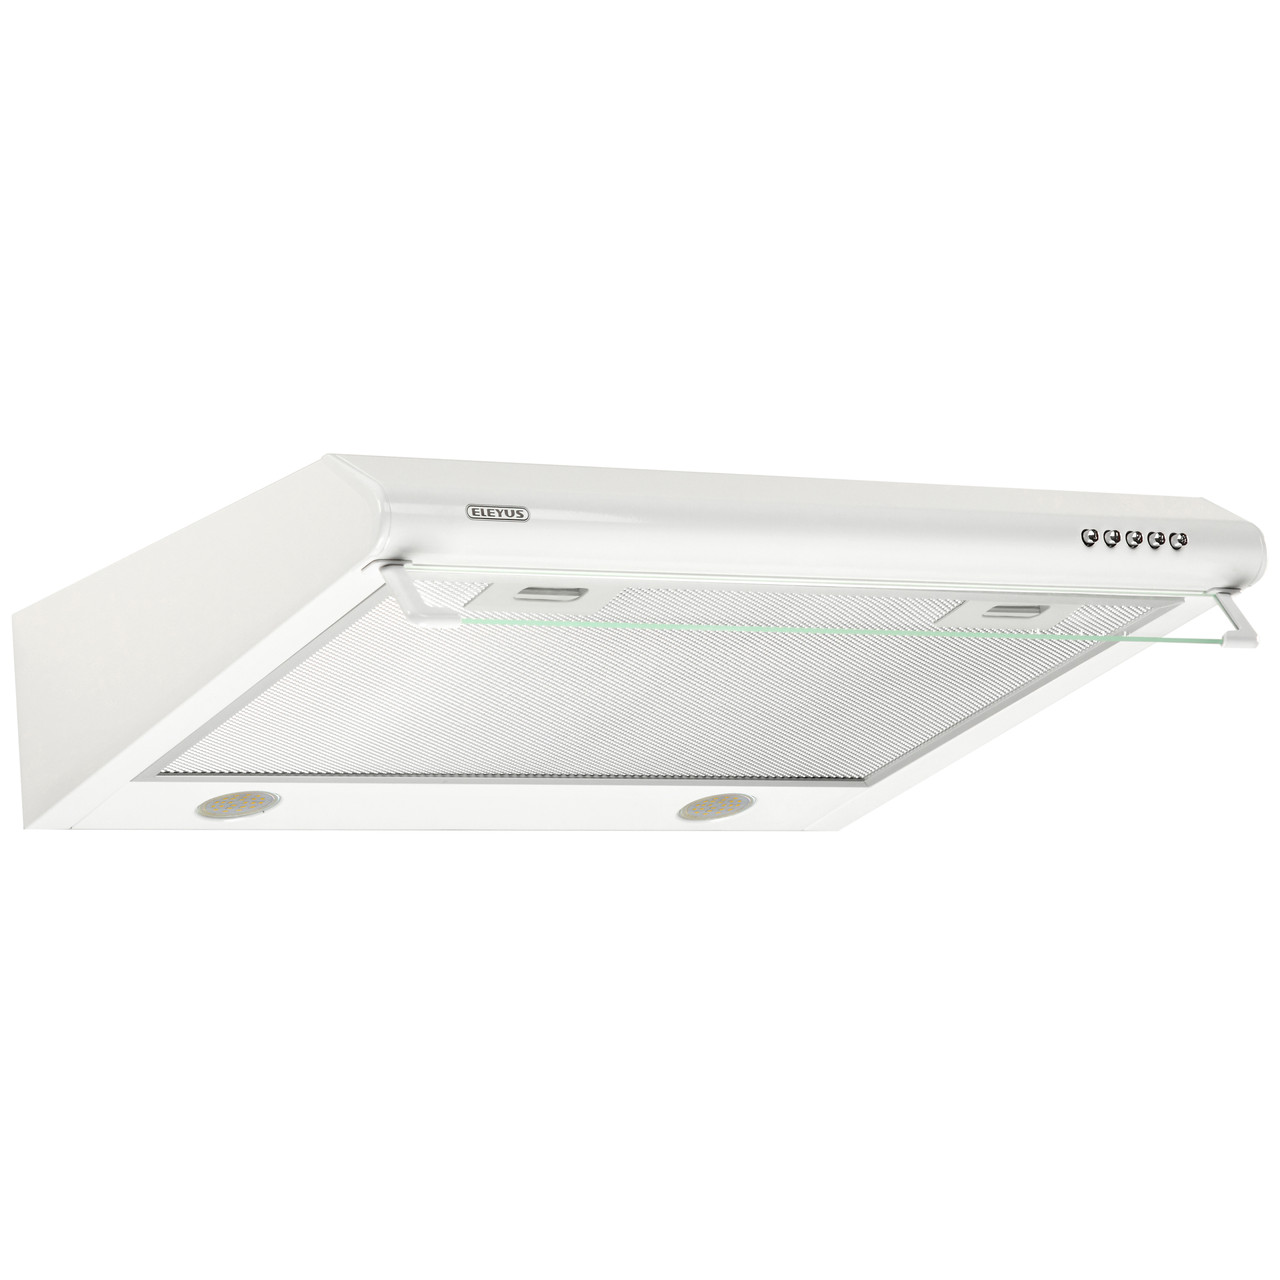 Витяжка кухонна ELEYUS BONA ІІ LED SMD 50 WH + Безкоштовна доставка!